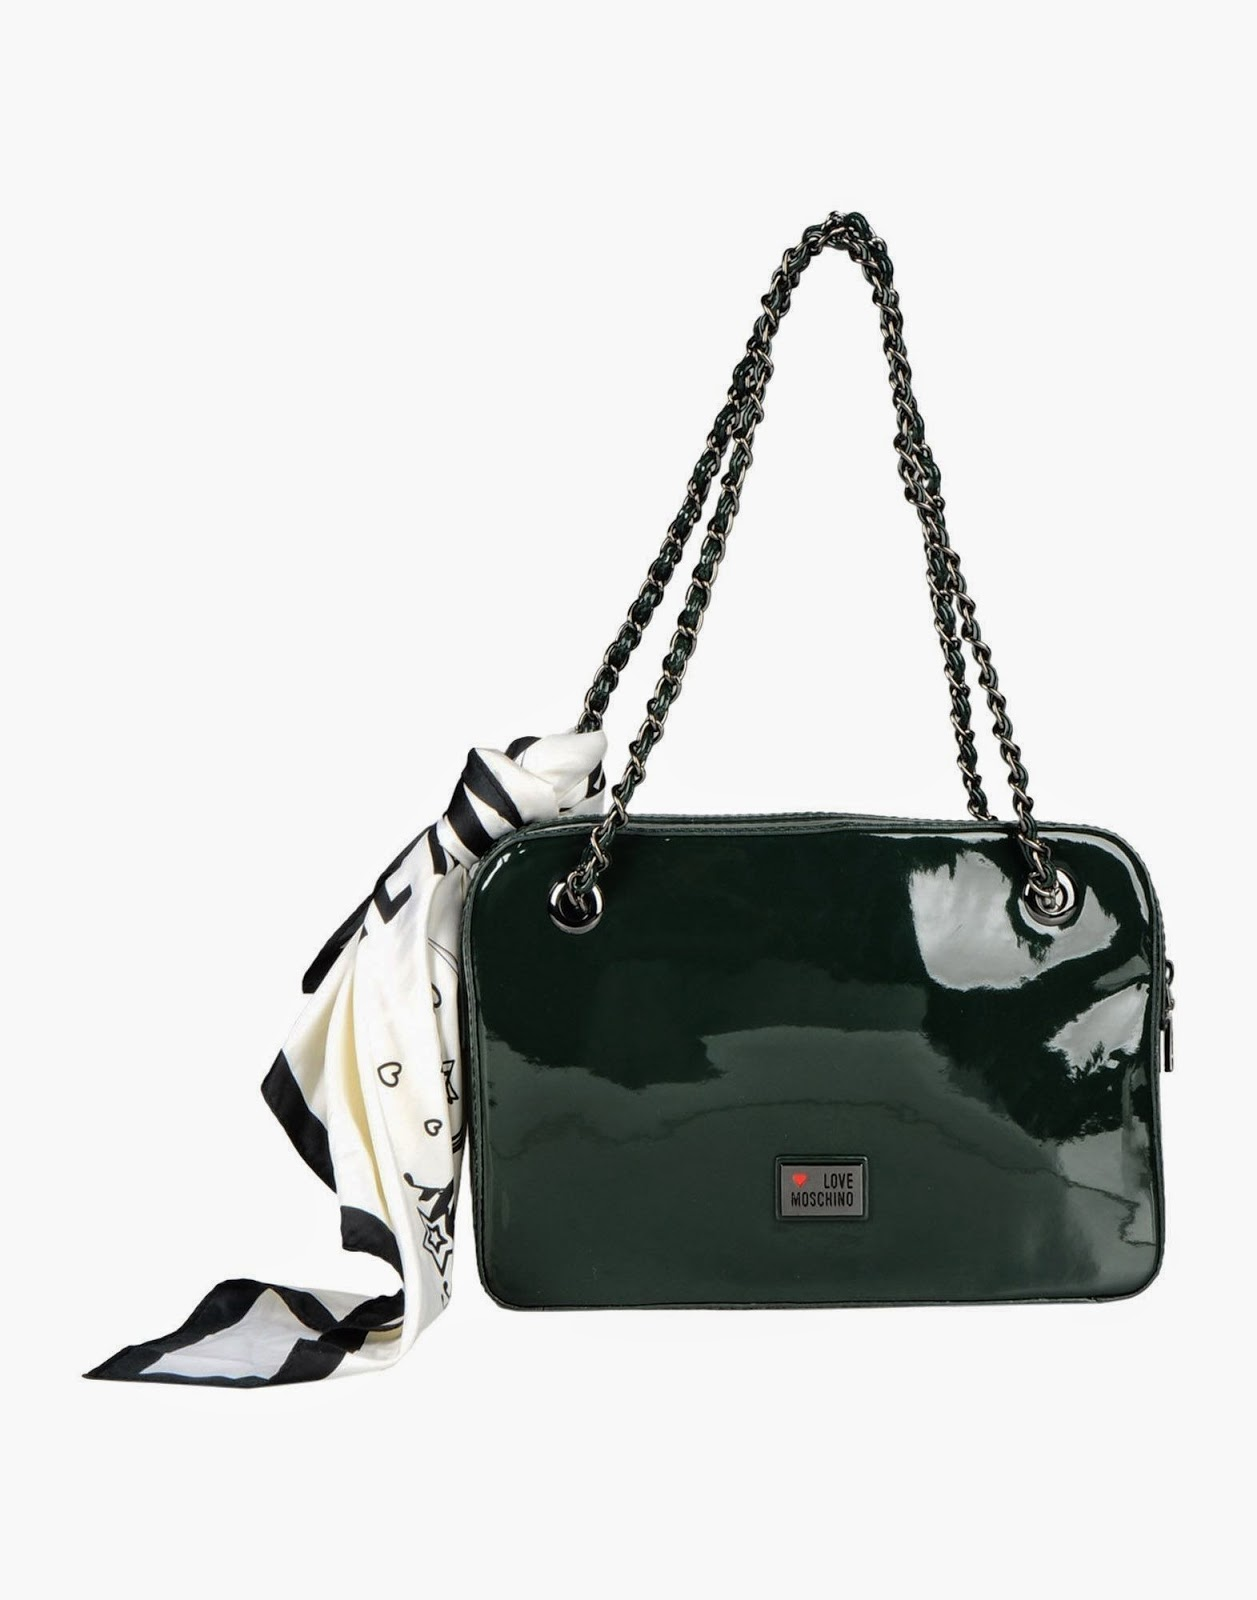 Gorgeous waterproof Moschino bag